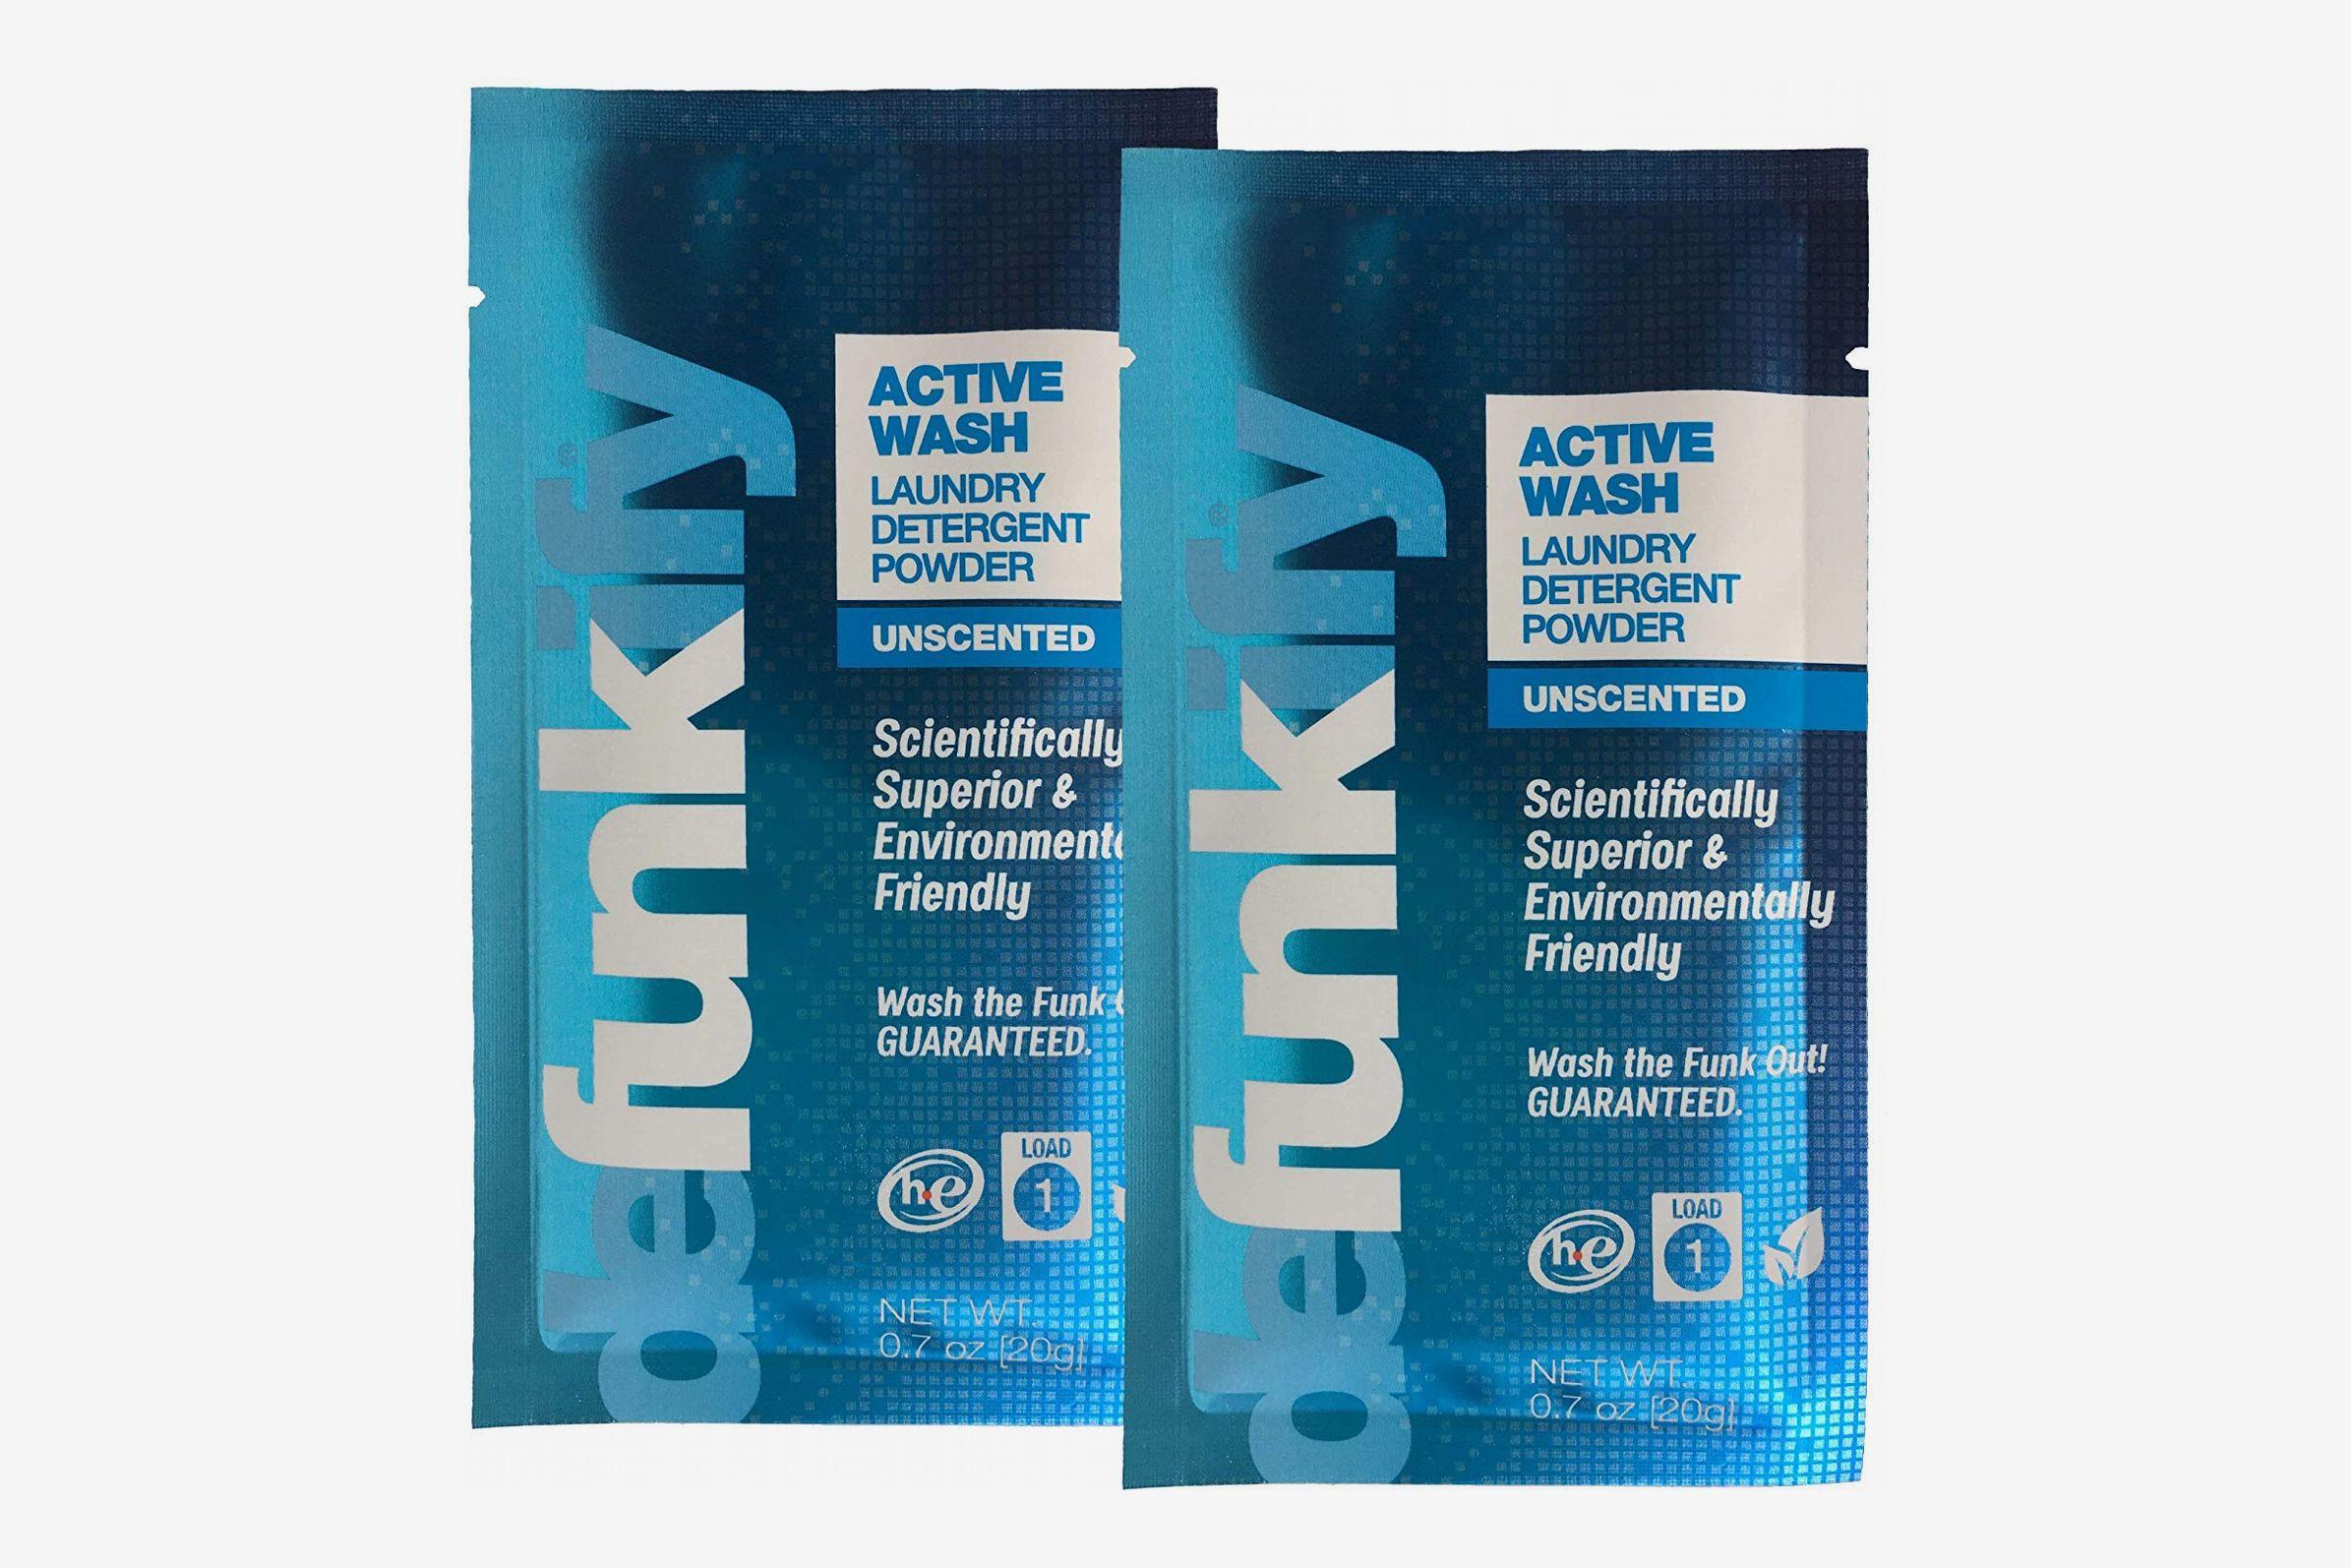 Defunkify Active Wear Laundry Detergent Powder